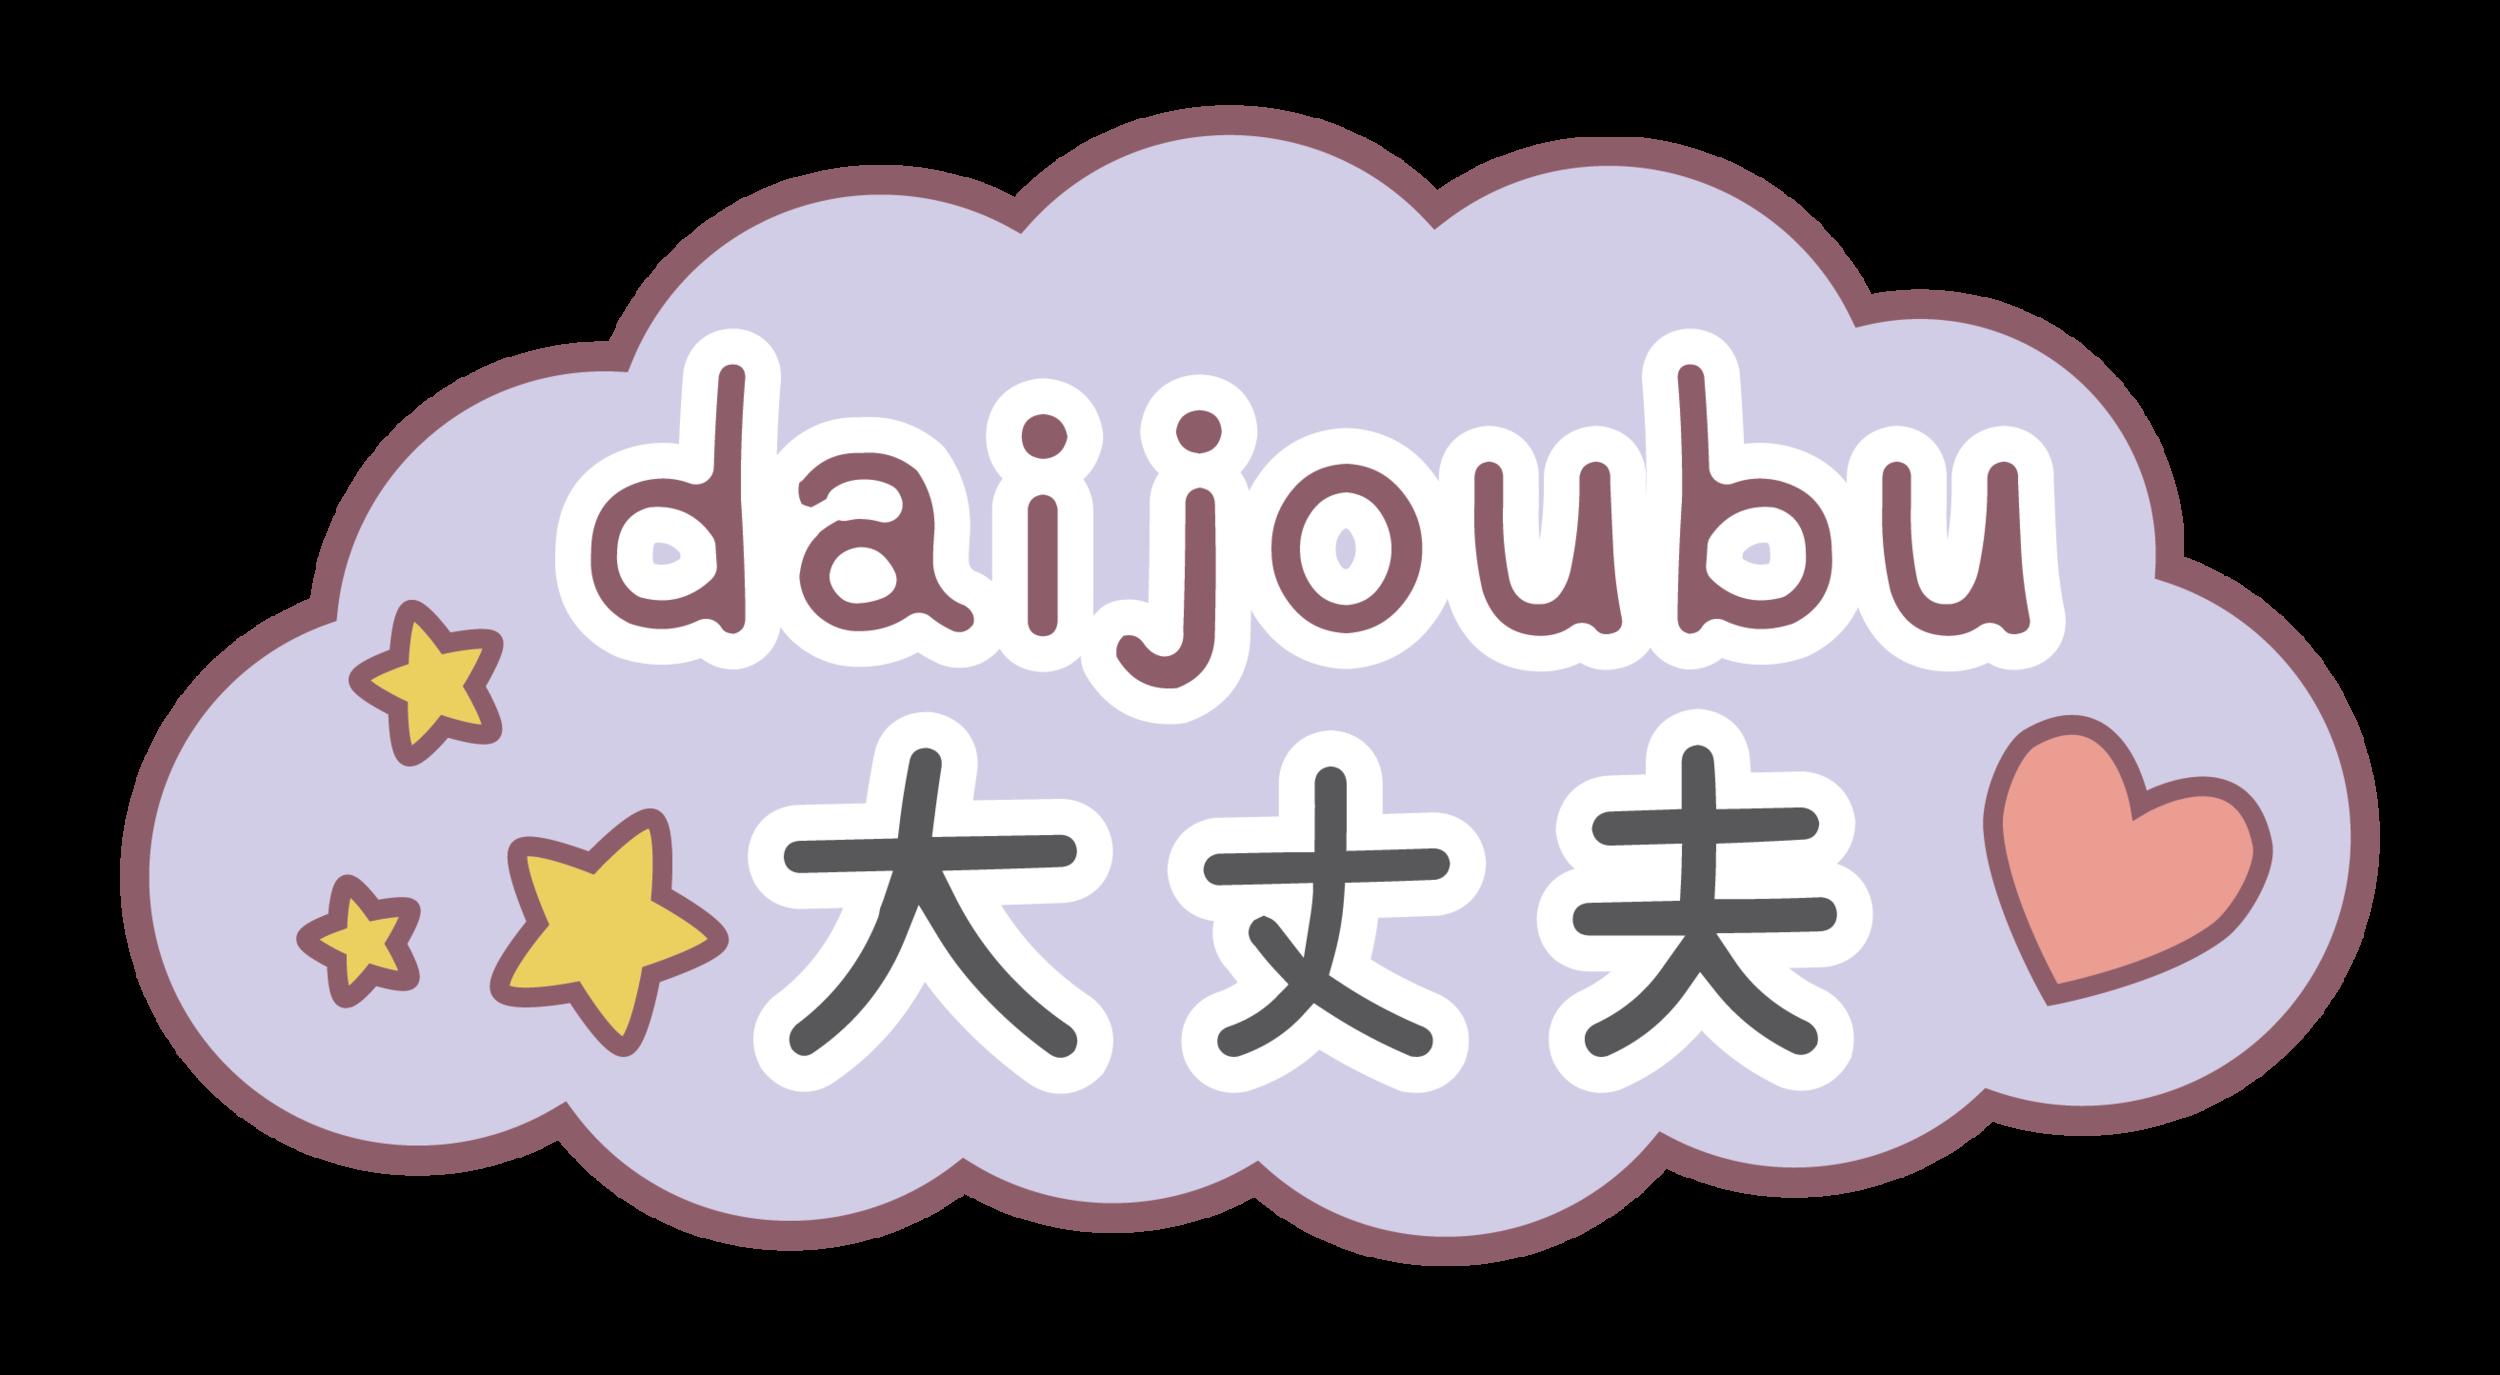 Copy of daijoubu_2-12-12.png